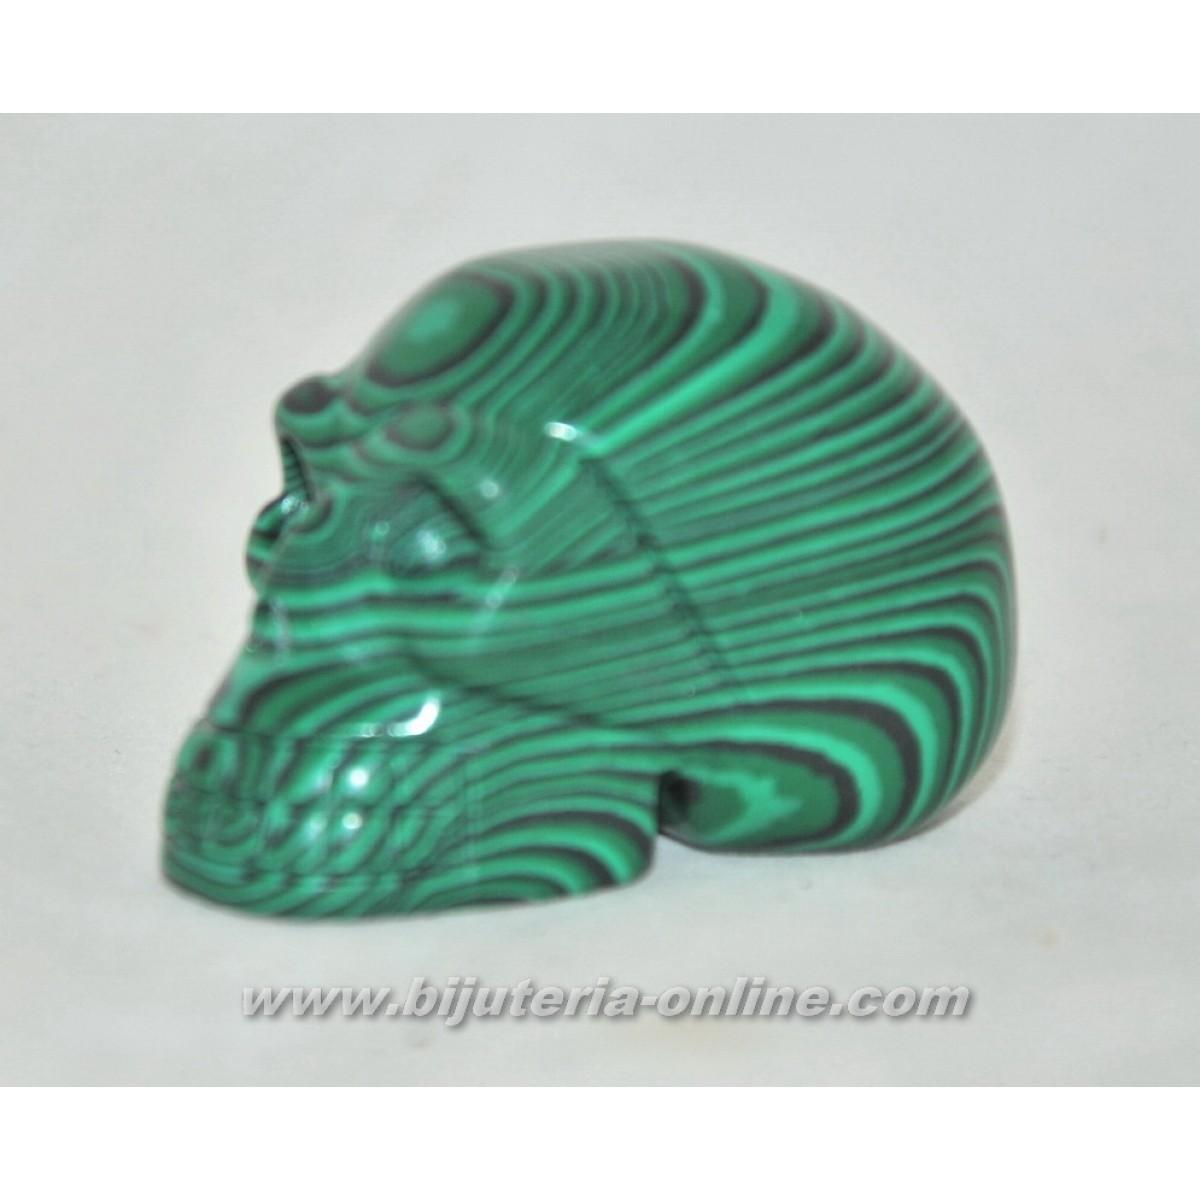 Фигурка череп от малахит